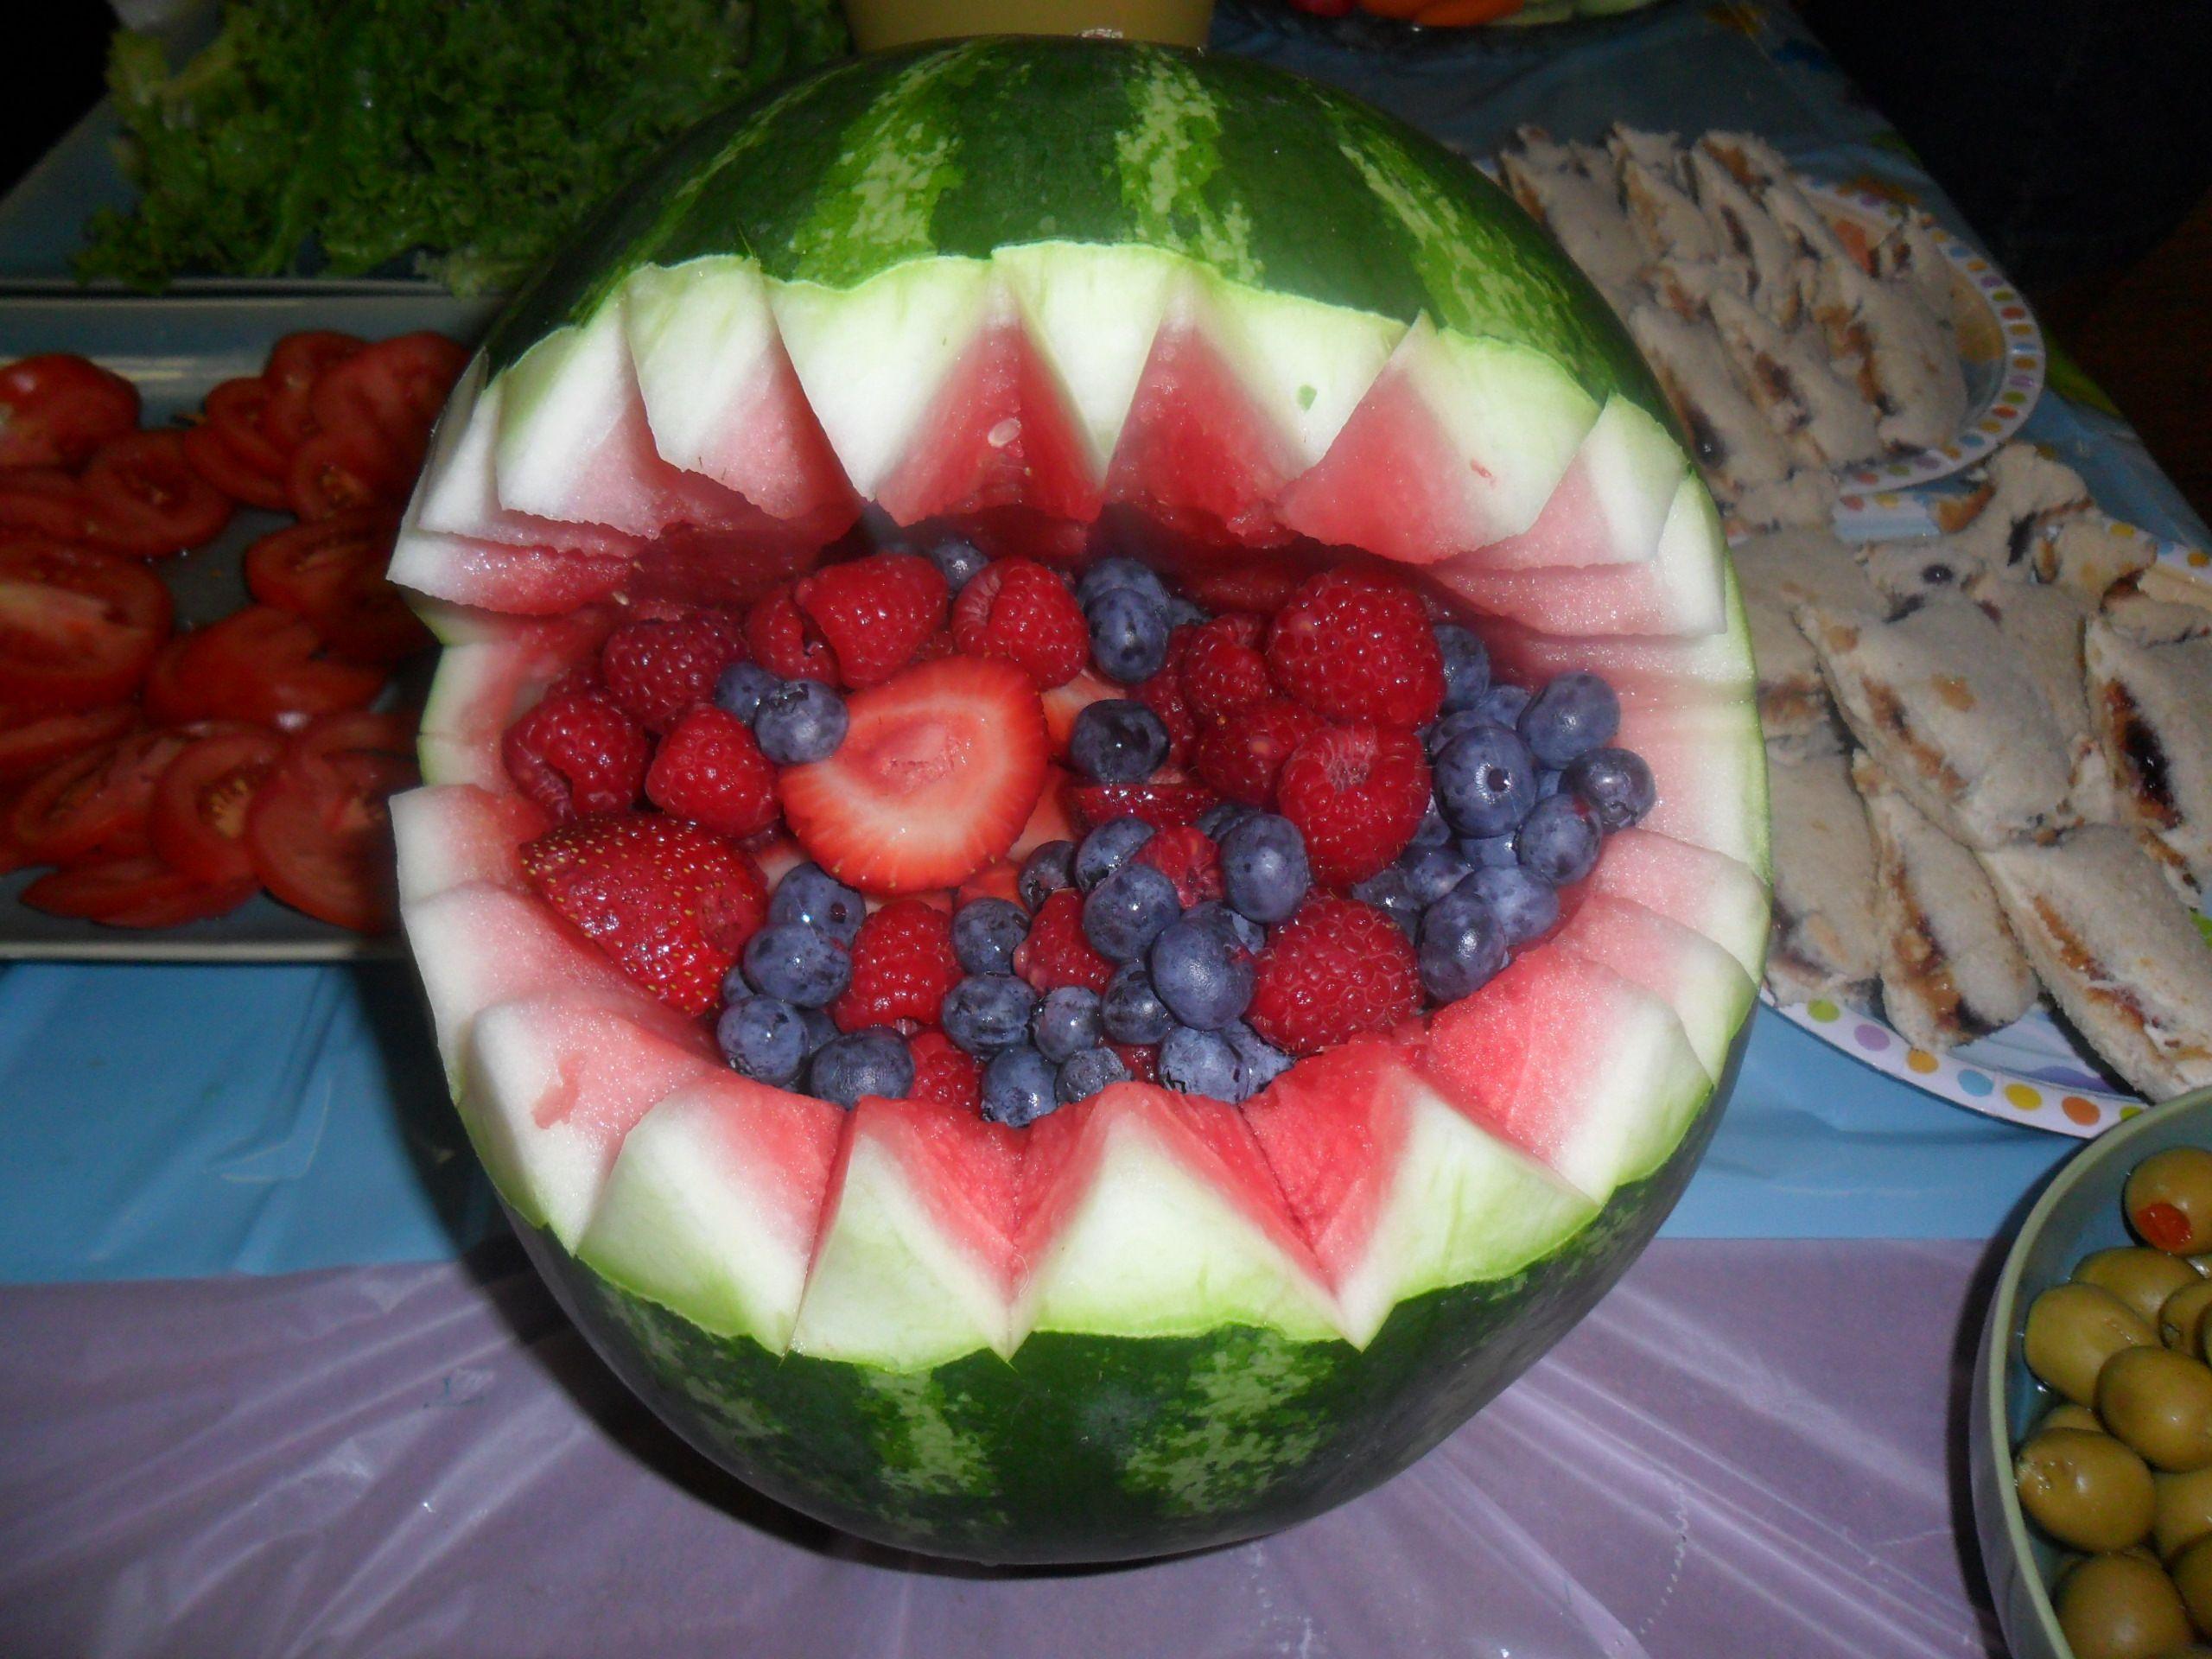 Item 5 Set 7 Vine Hand Painted Veggie Fruit Ceramic Picnic Divided Serving Plates